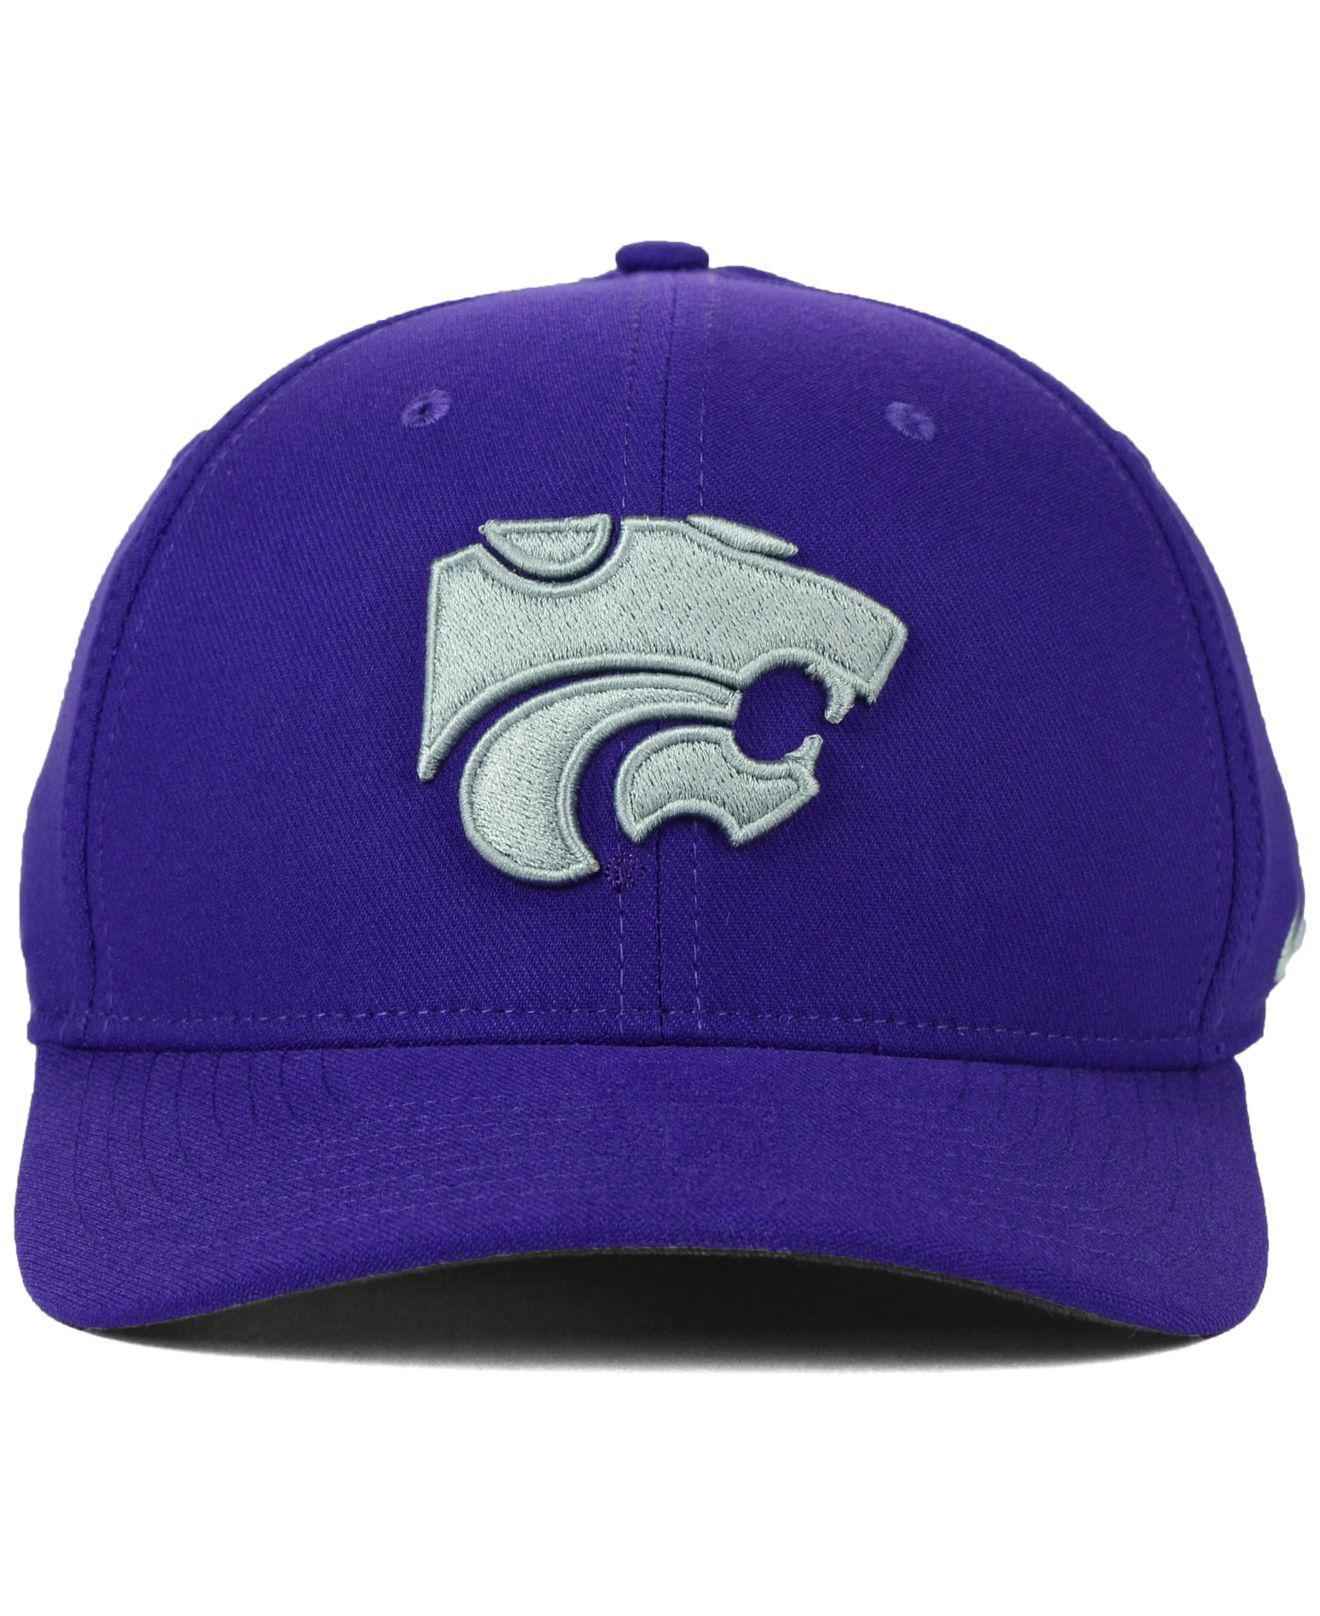 sale retailer d19c5 84bf6 Lyst - Nike Kansas State Wildcats Classic Swoosh Cap in Purple for Men